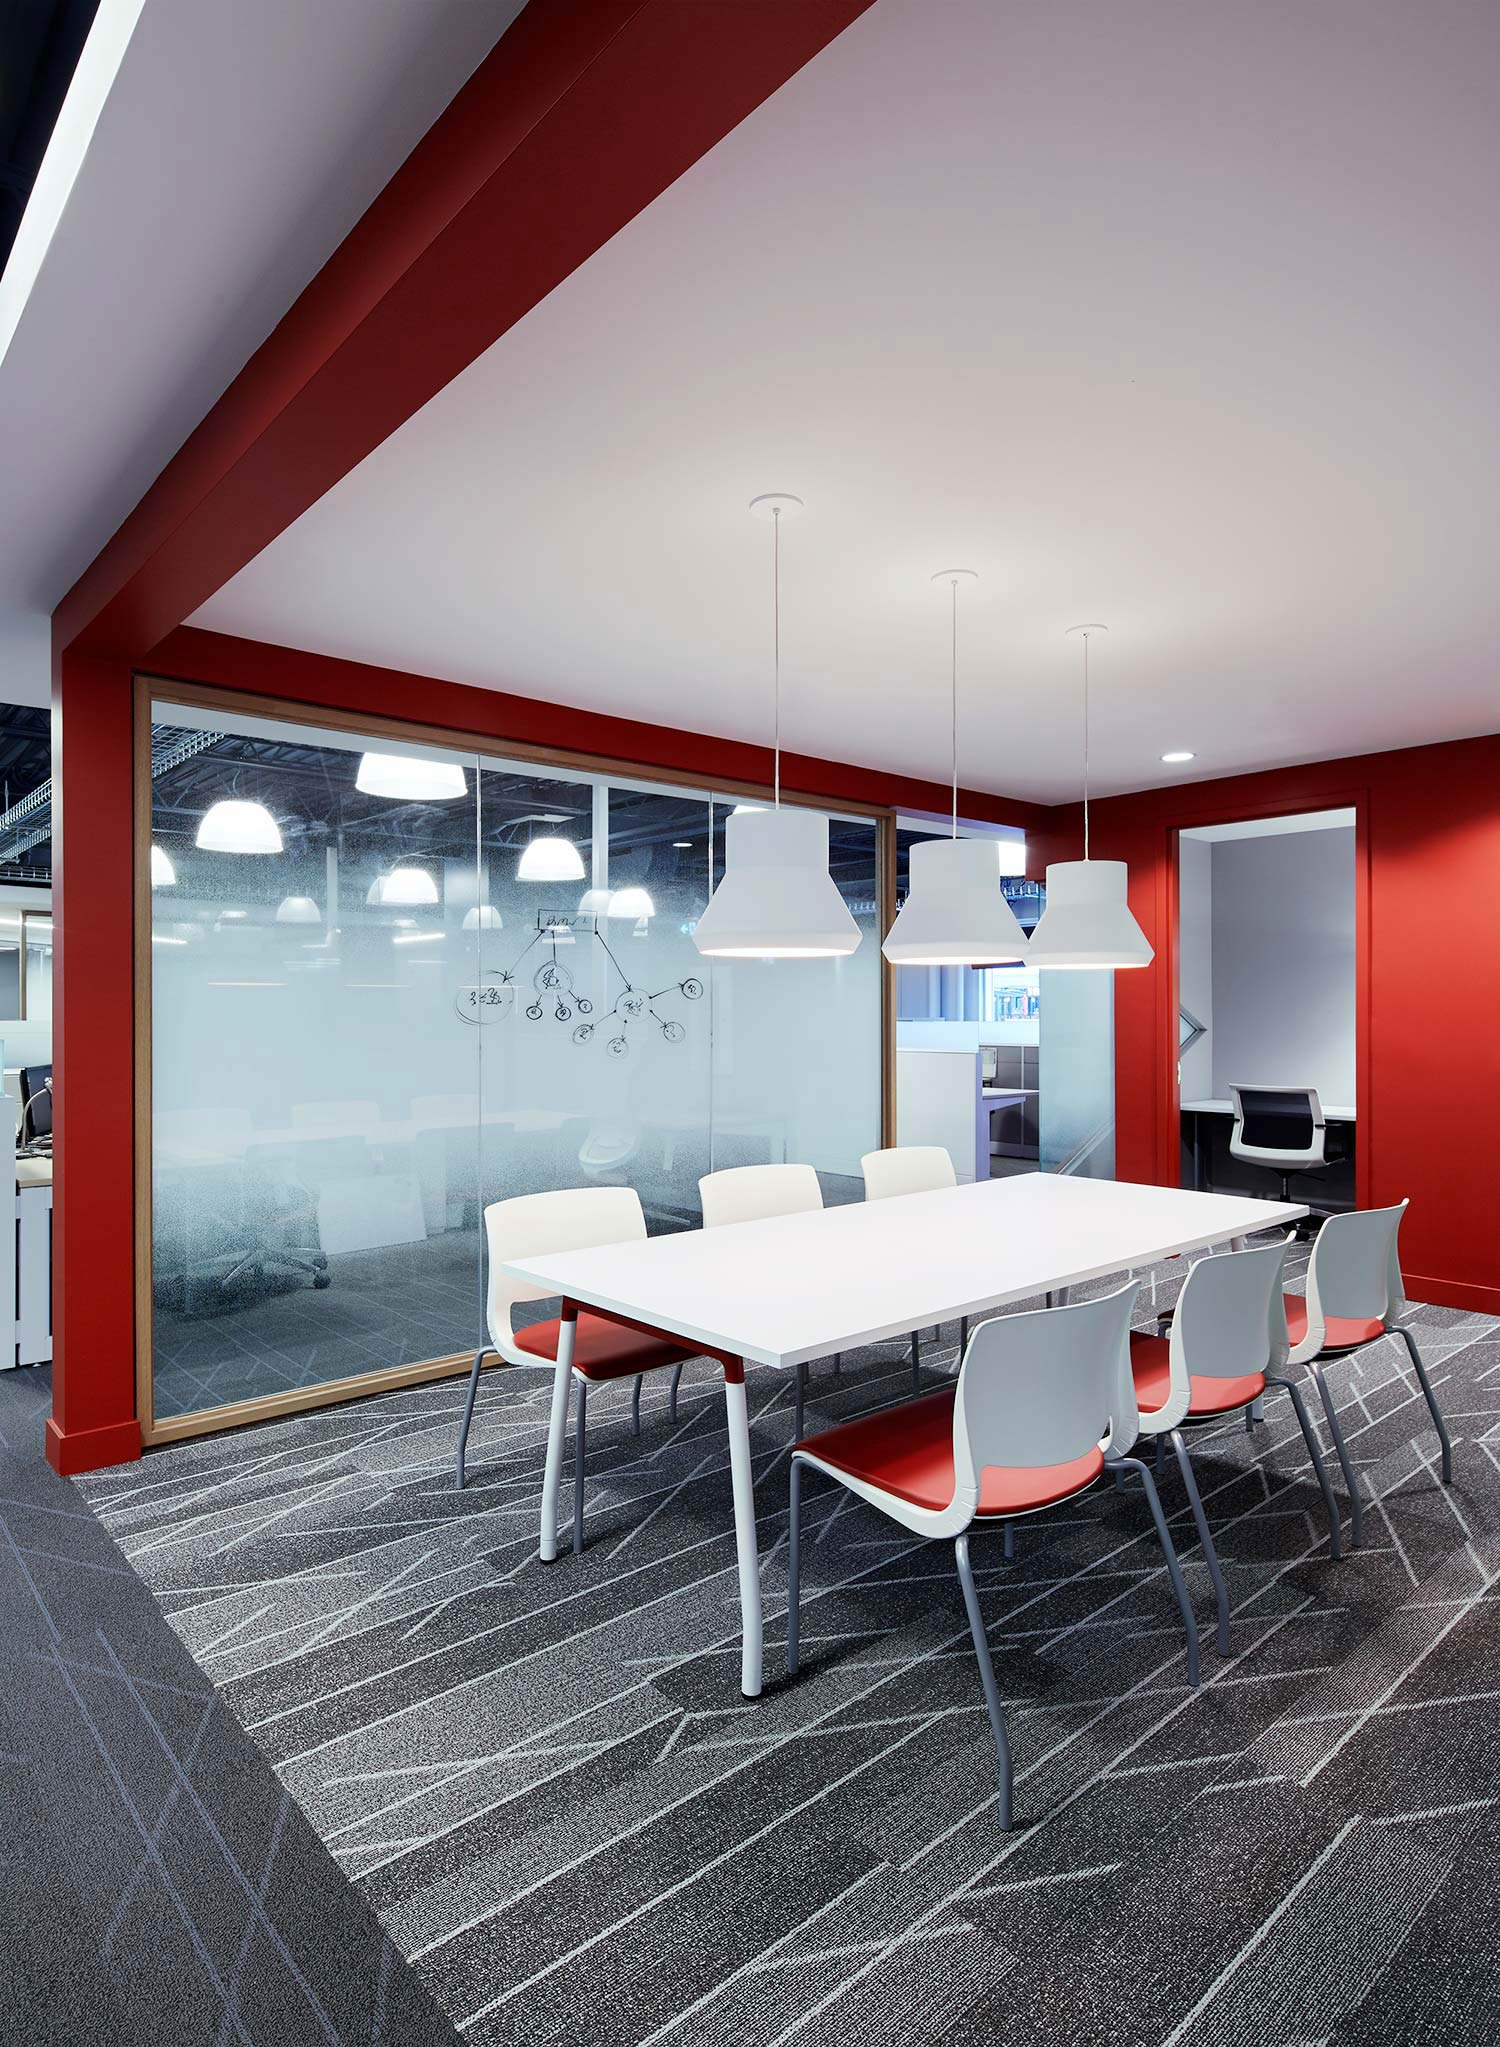 halifax-interior-design-tech-conference-room.jpg